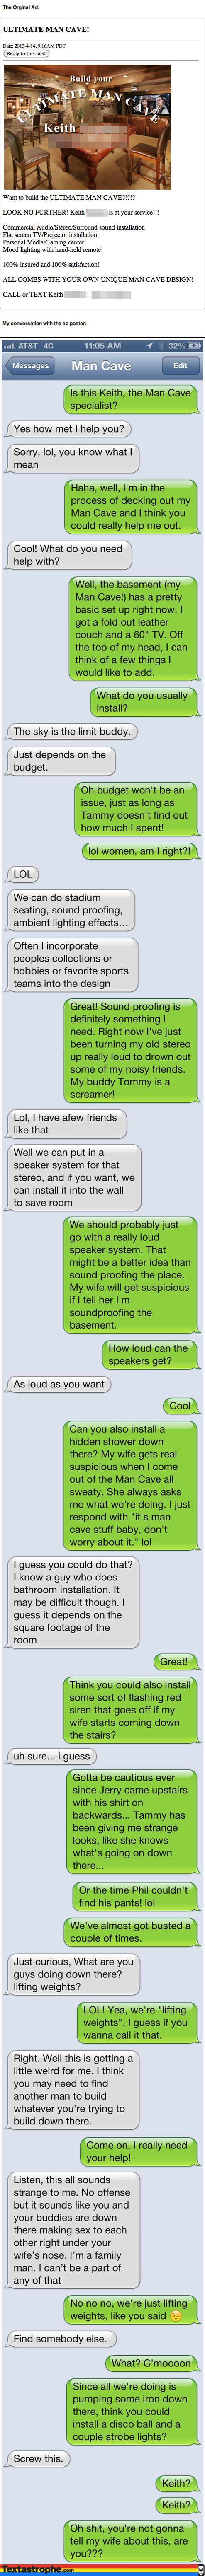 Man Cave Prank. via Textastrophe dot com. text Prank troll mancave textastrophe trolling man Cave